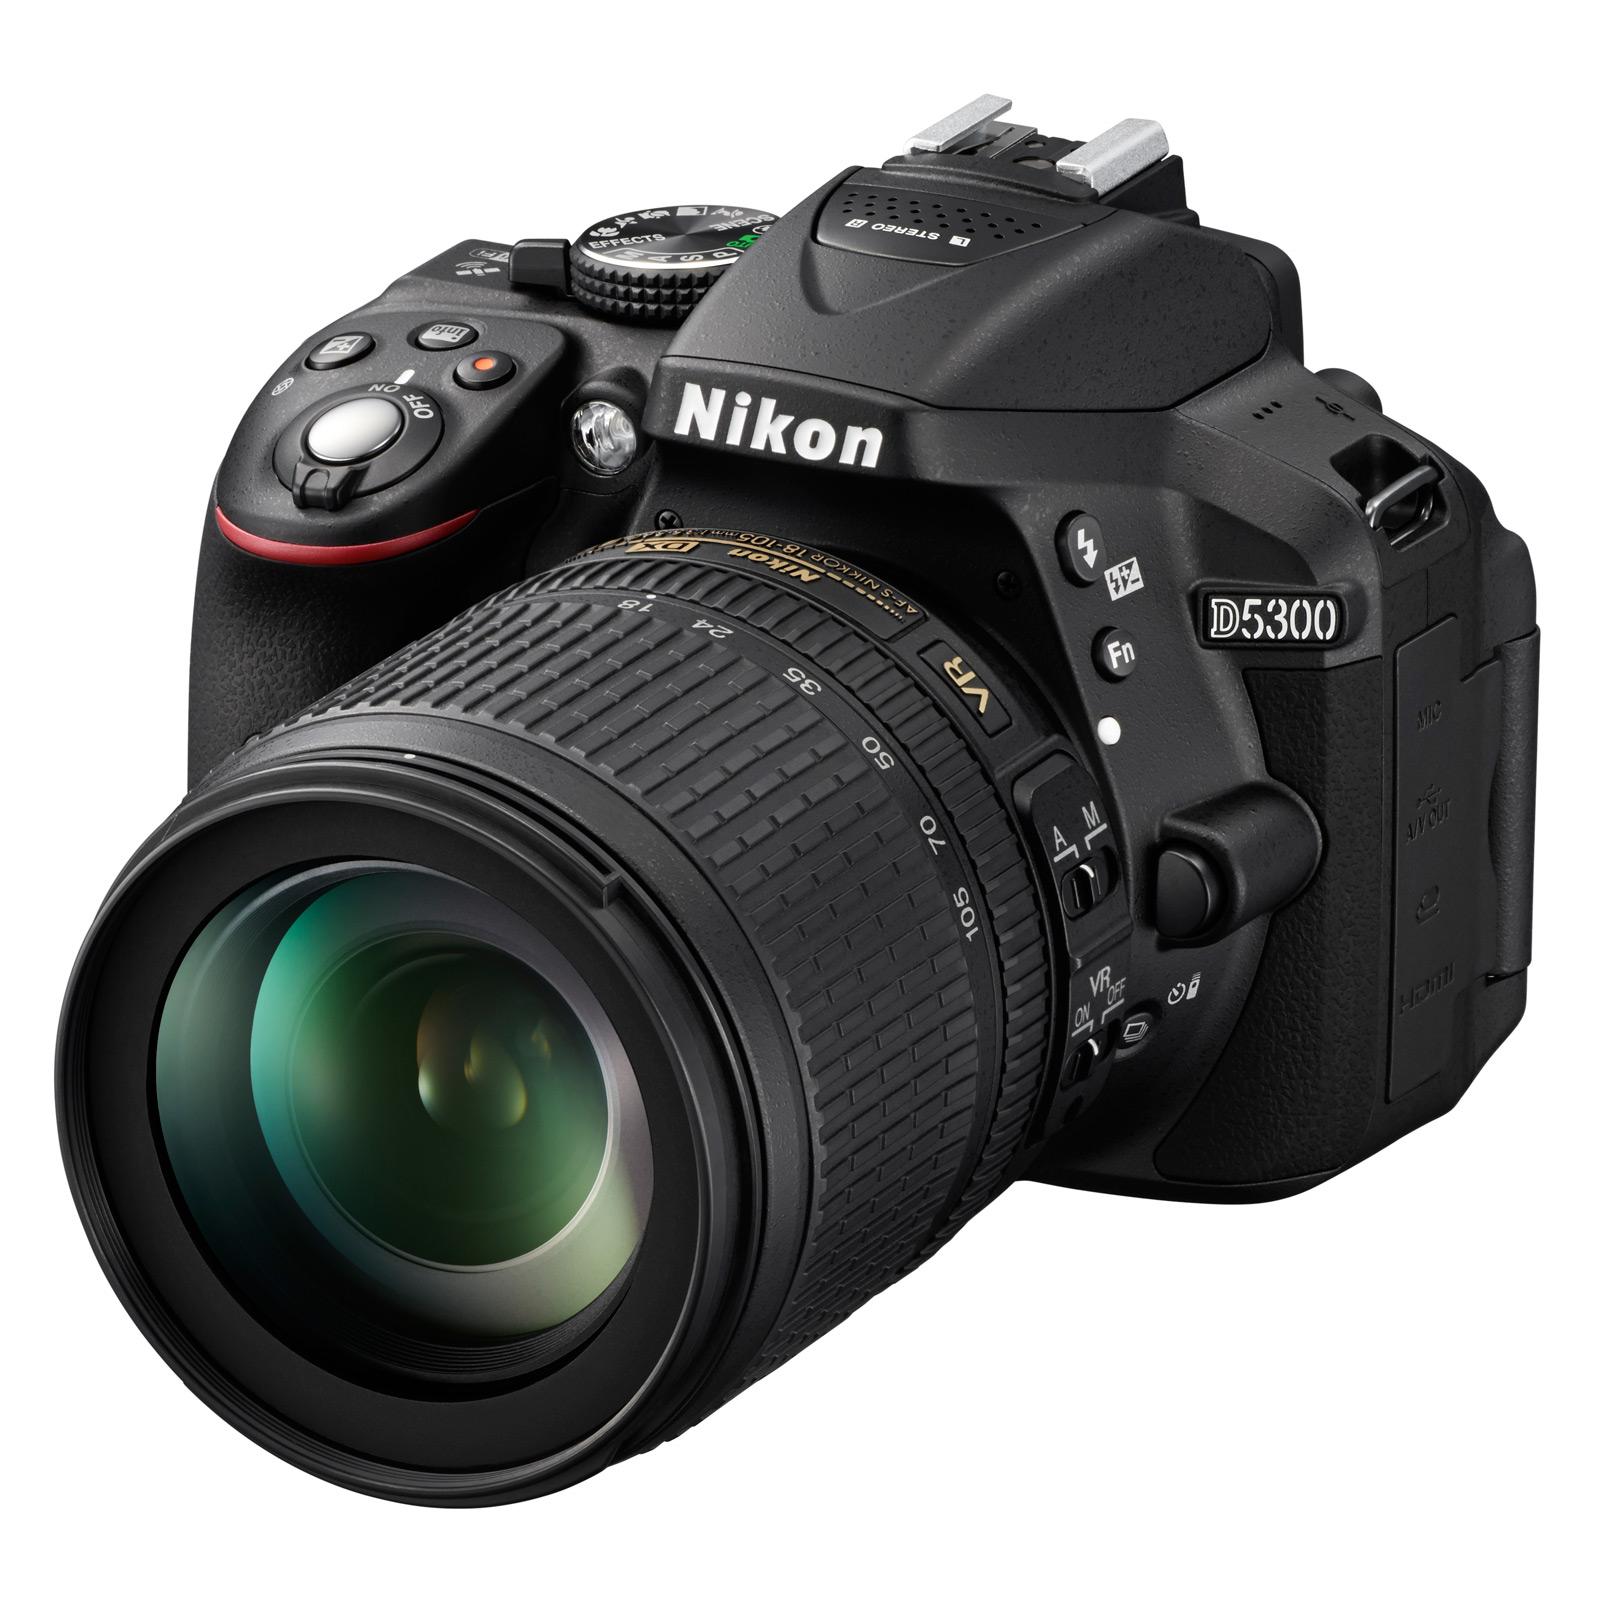 nikon d5300 + af-s dx nikkor 18-105 mm - appareil photo reflex nikon